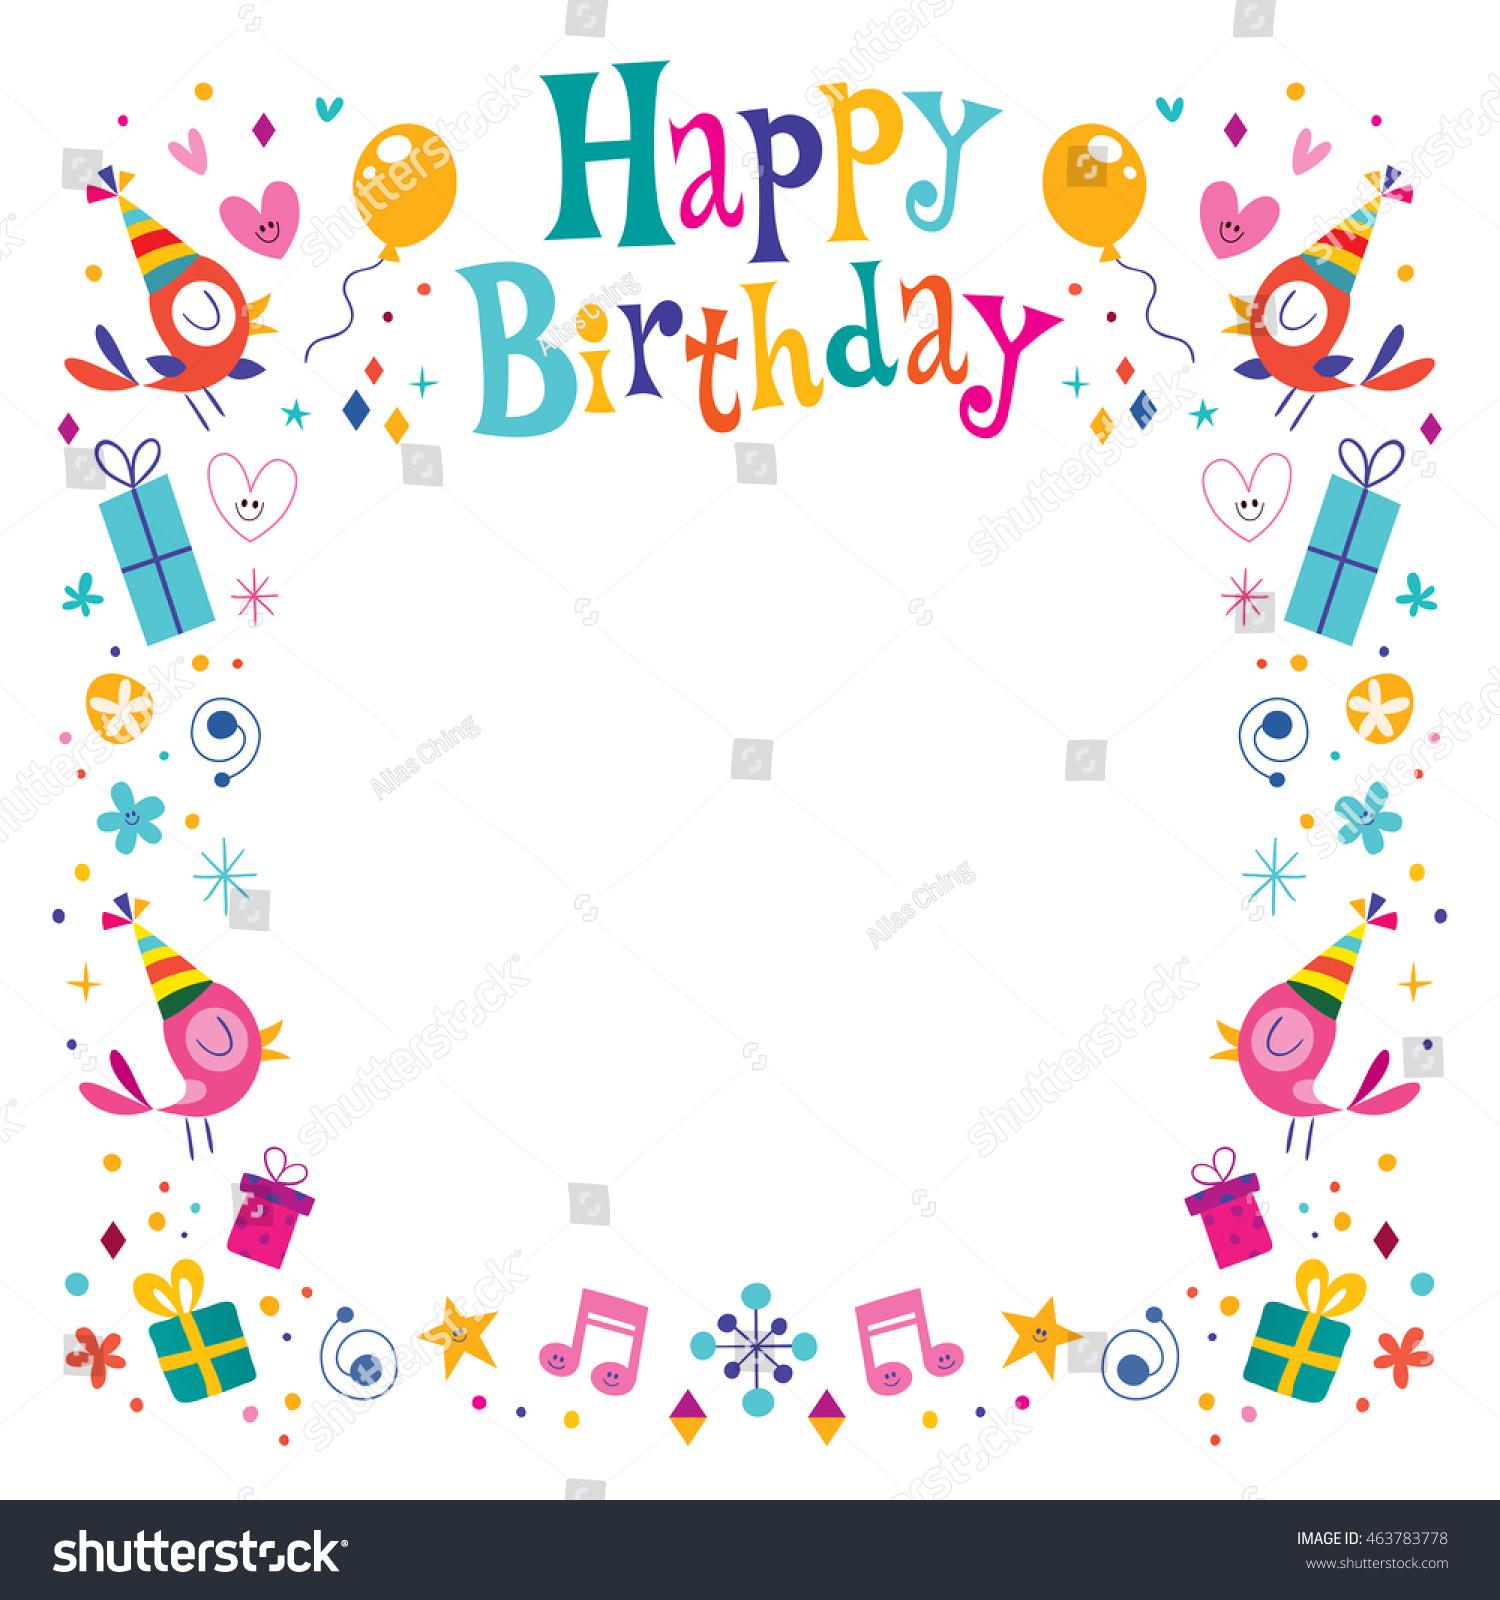 Birthday Frames Free Download